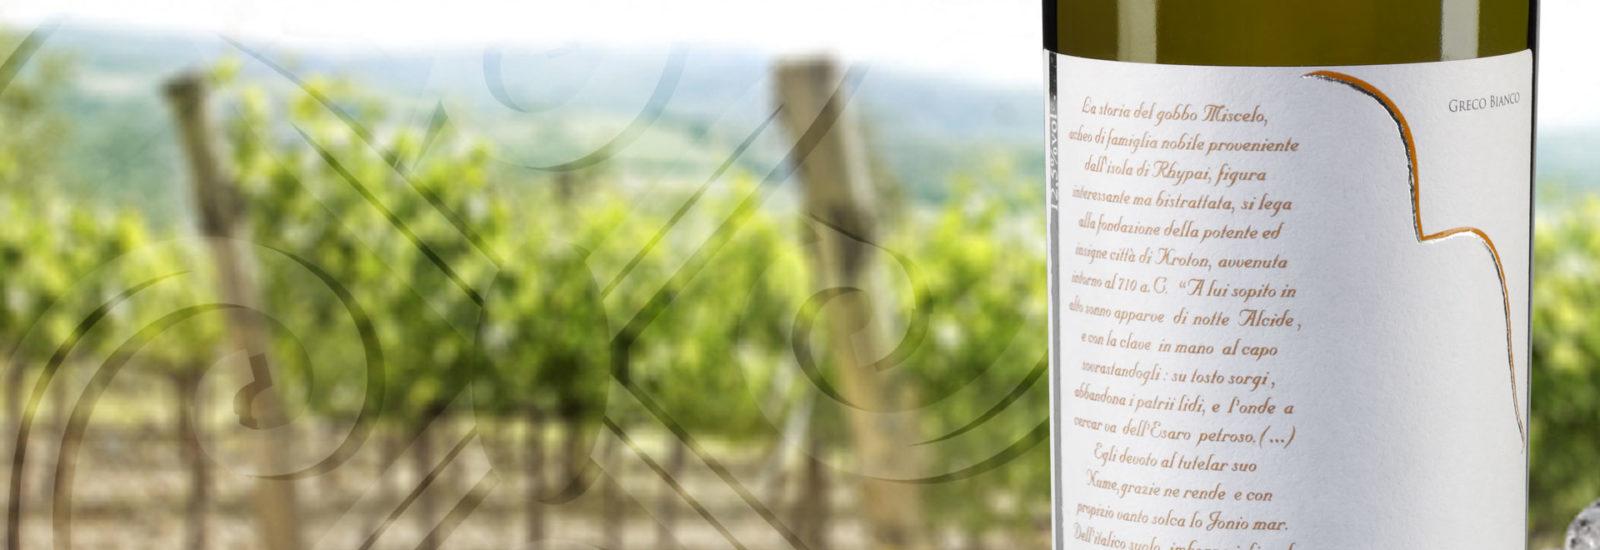 Vini Marrelli Wines